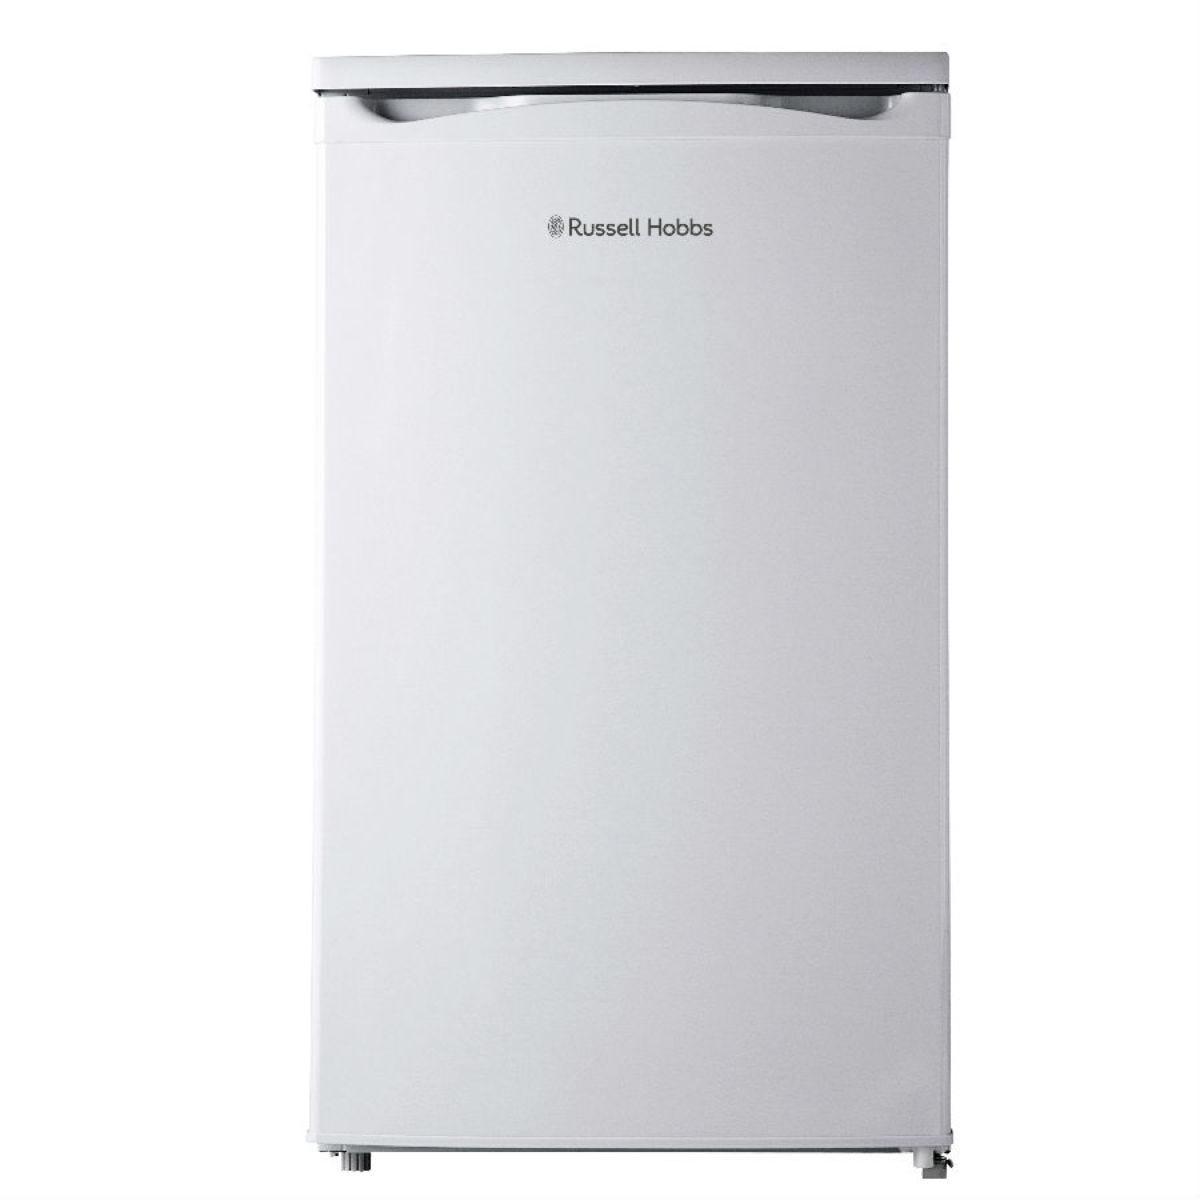 Russell Hobbs RHUCLF2W 68L Under Counter Freezer - White